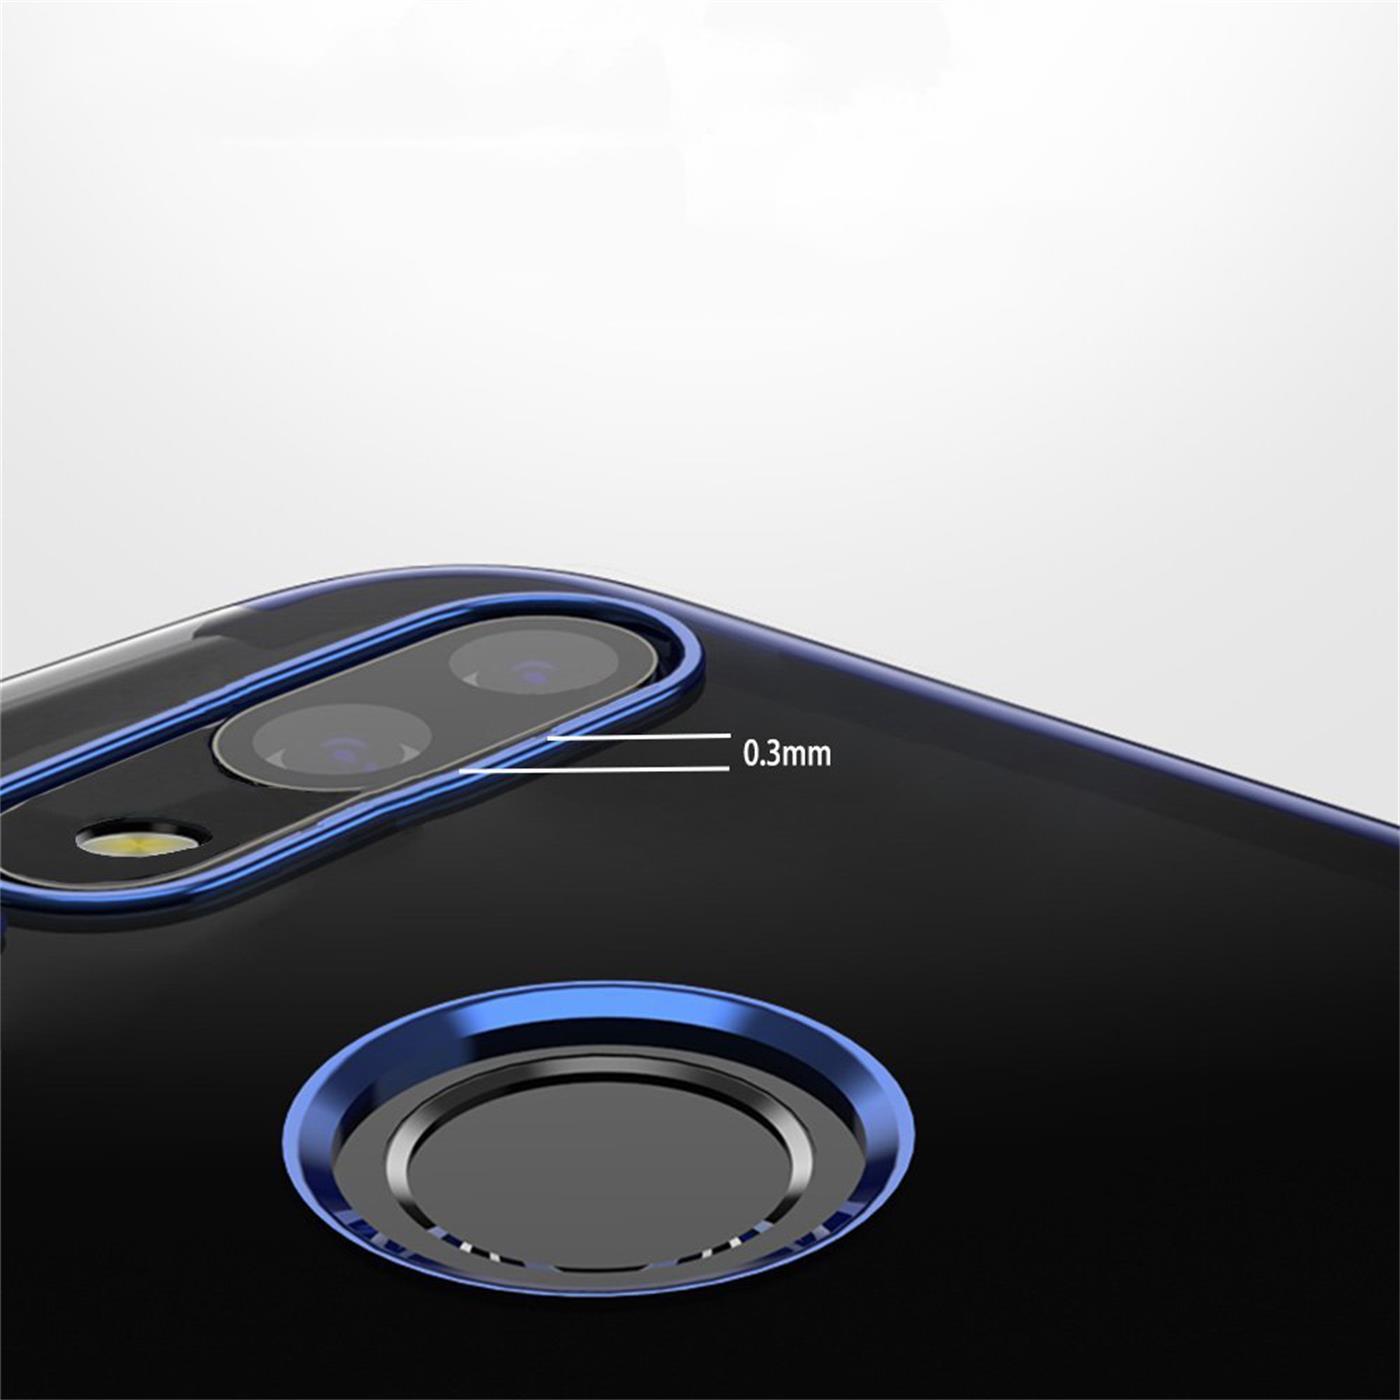 Silikon-Klar-Case-fuer-Huawei-p20-Lite-Ultra-Slim-Stossfeste-Gel-Rueckseite Indexbild 18